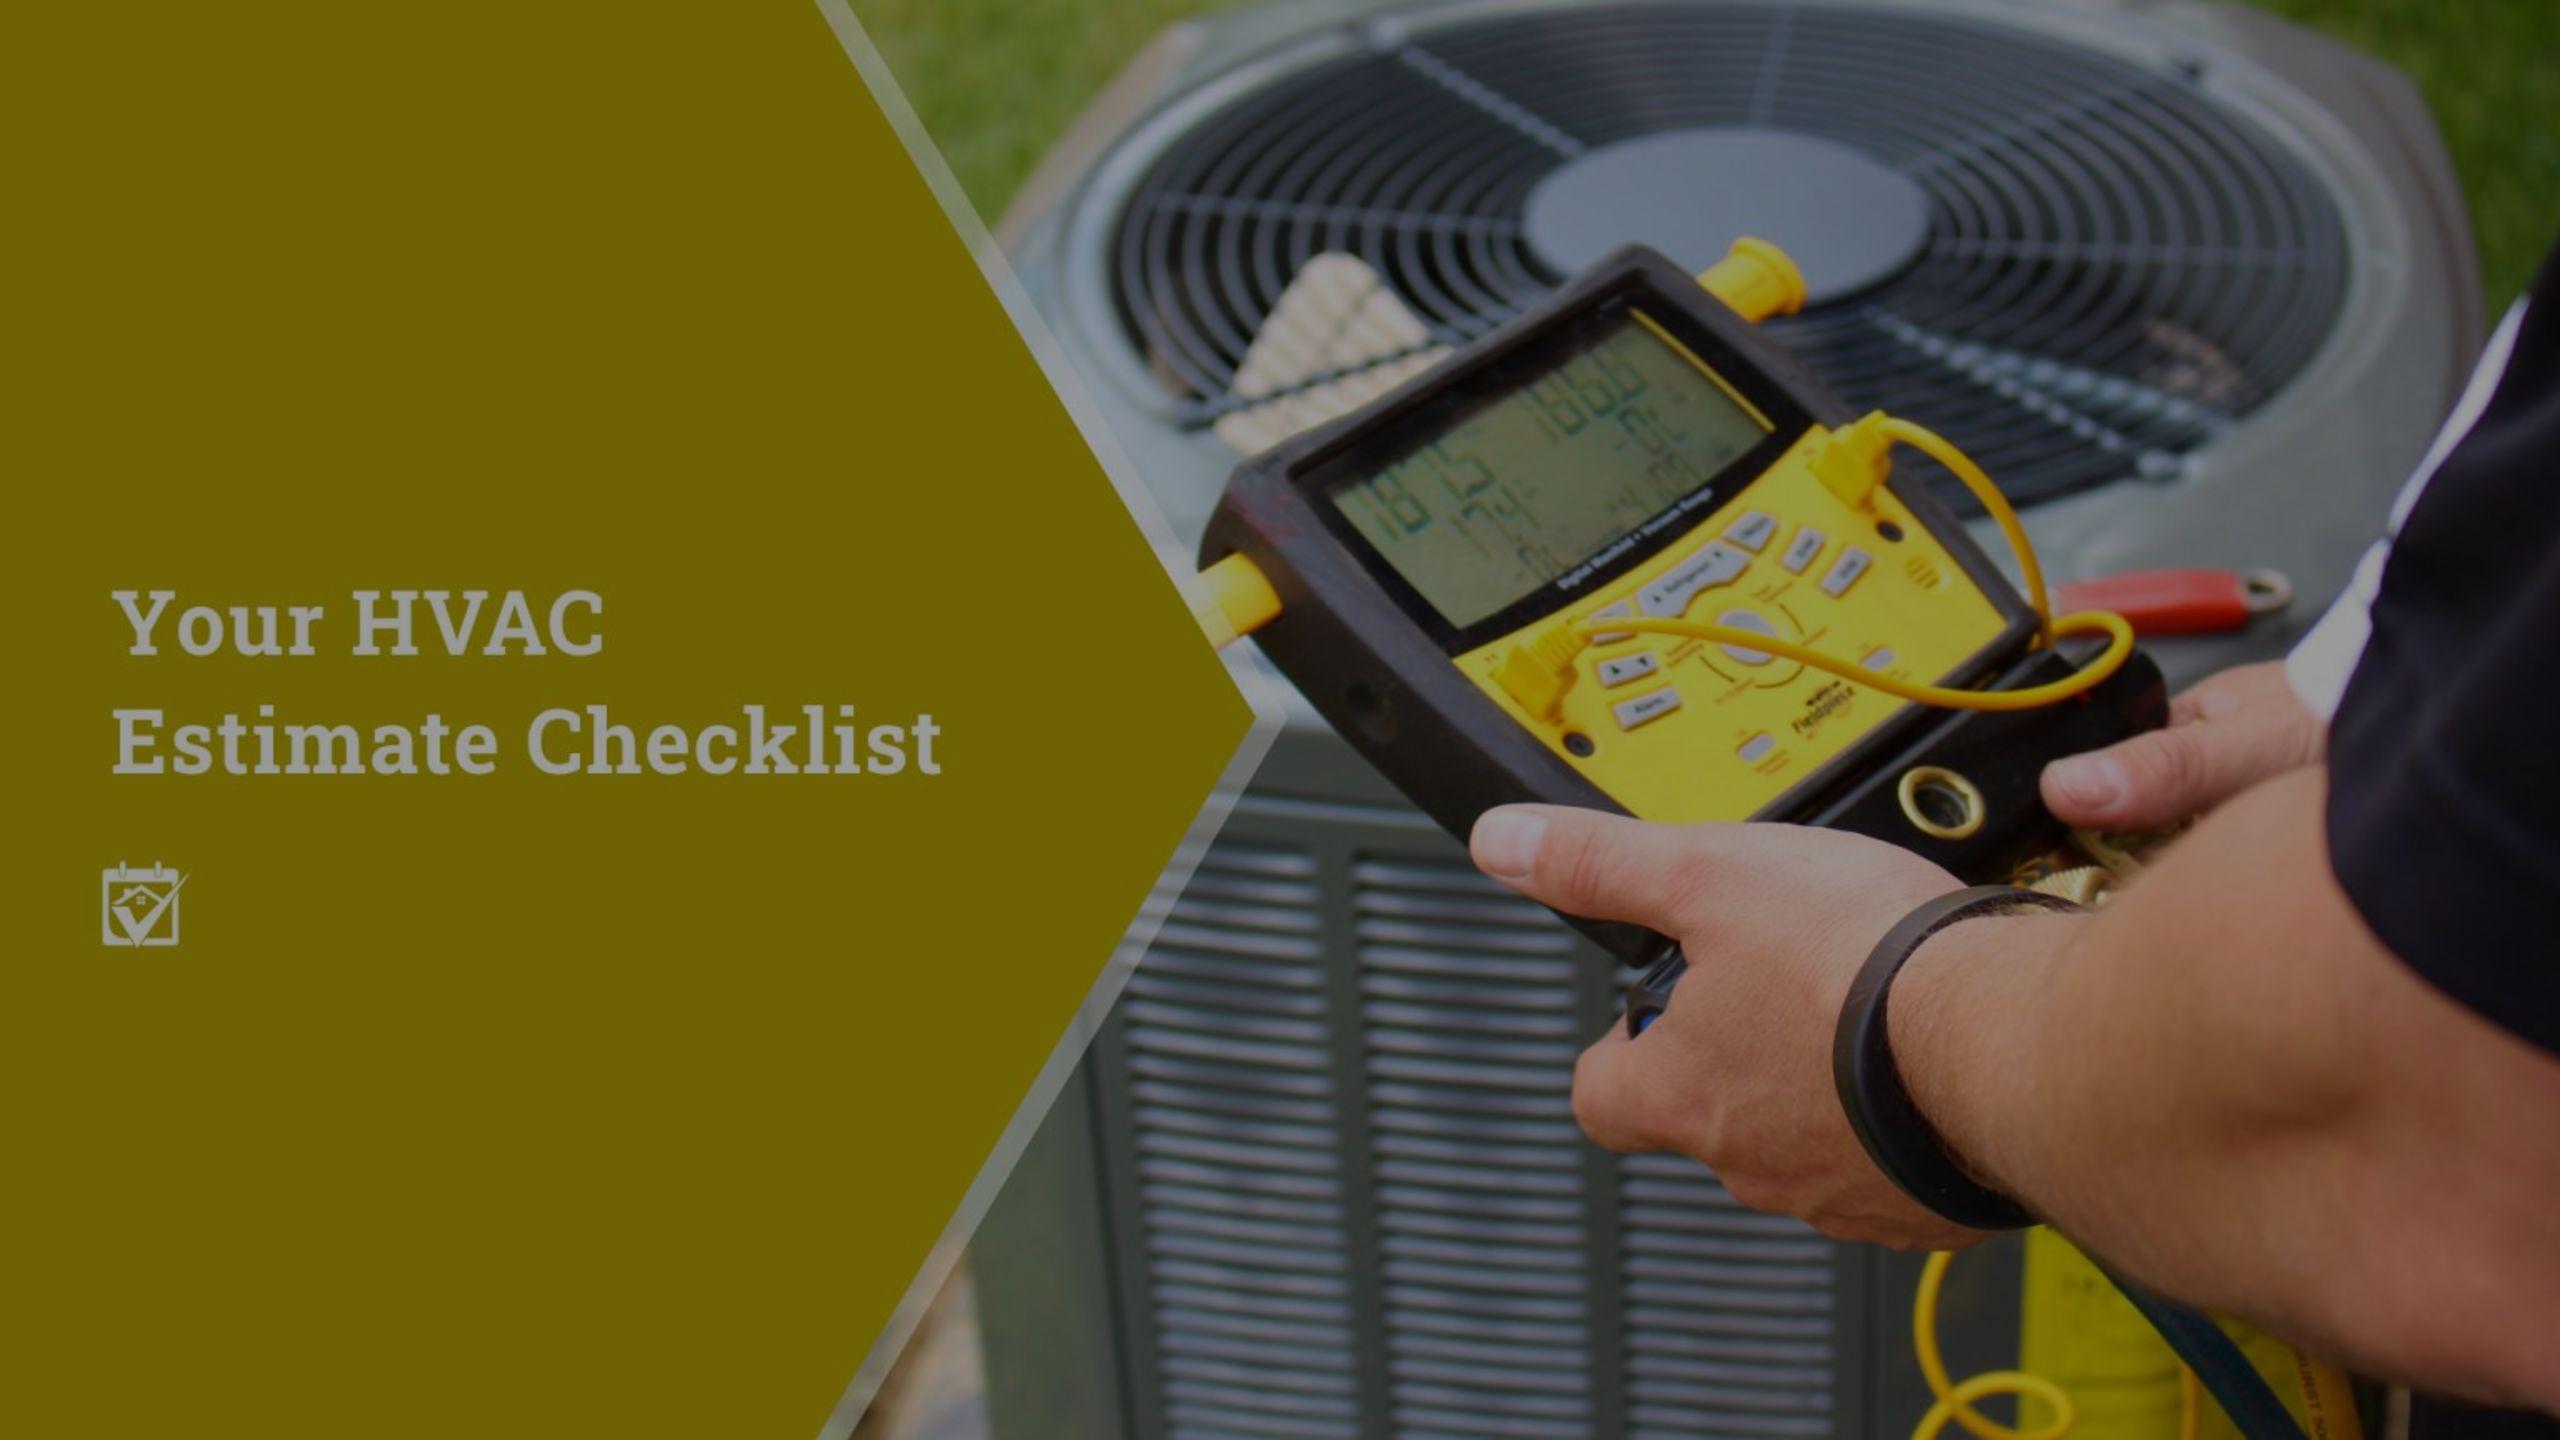 Your HVAC Estimate Checklist